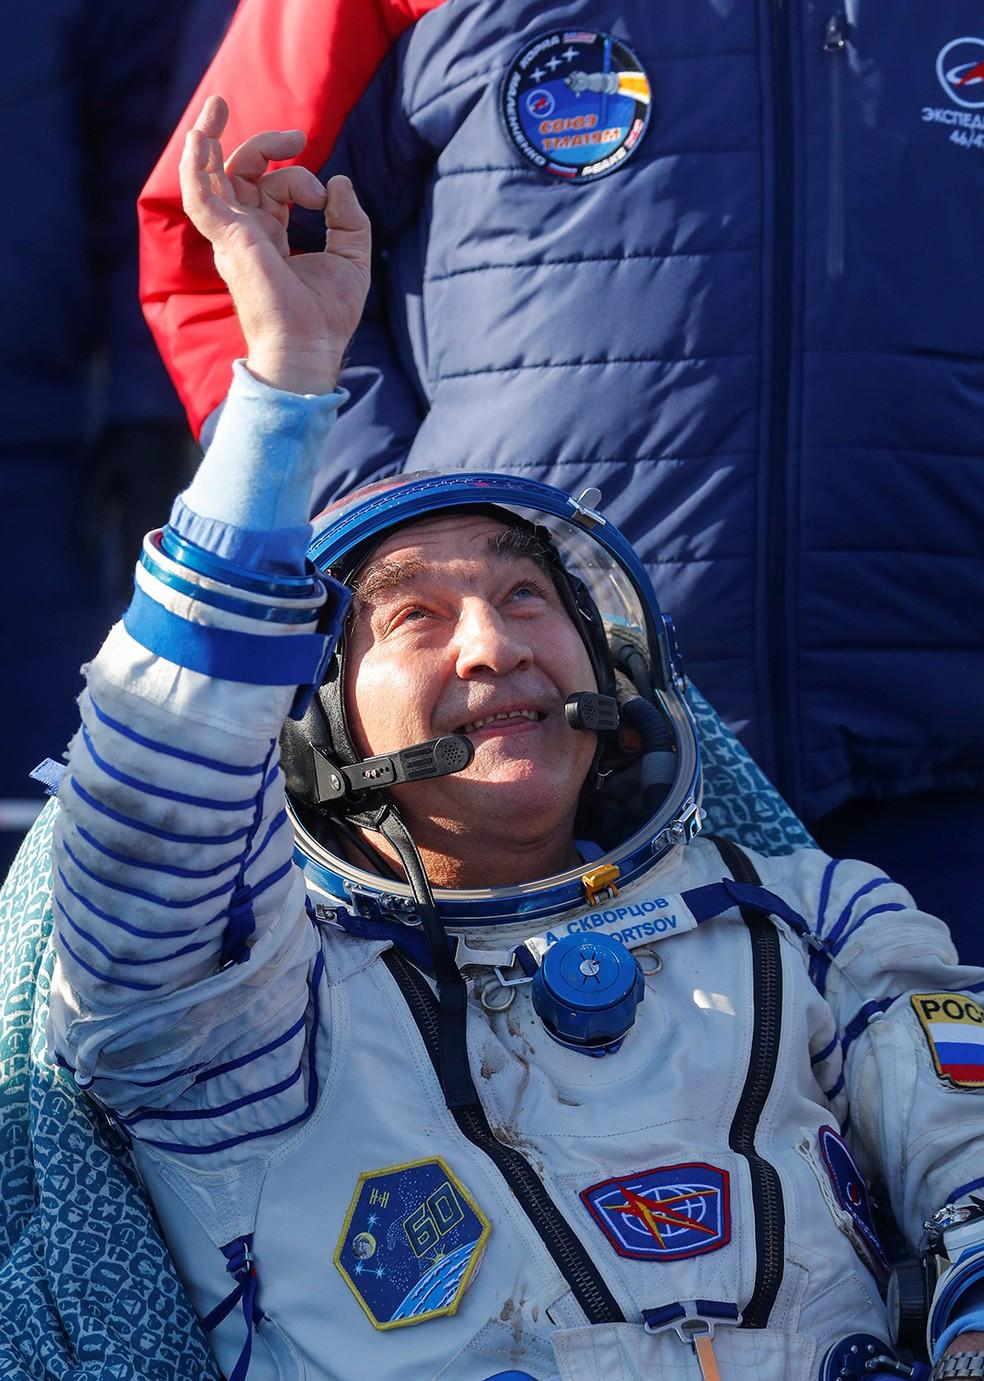 Cosmonauta Alexander Skvortsov após aterrissar no Cazaquistão nesta quinta-feira (6). — Foto: Sergei Ilnitsky/Pool via Reuters